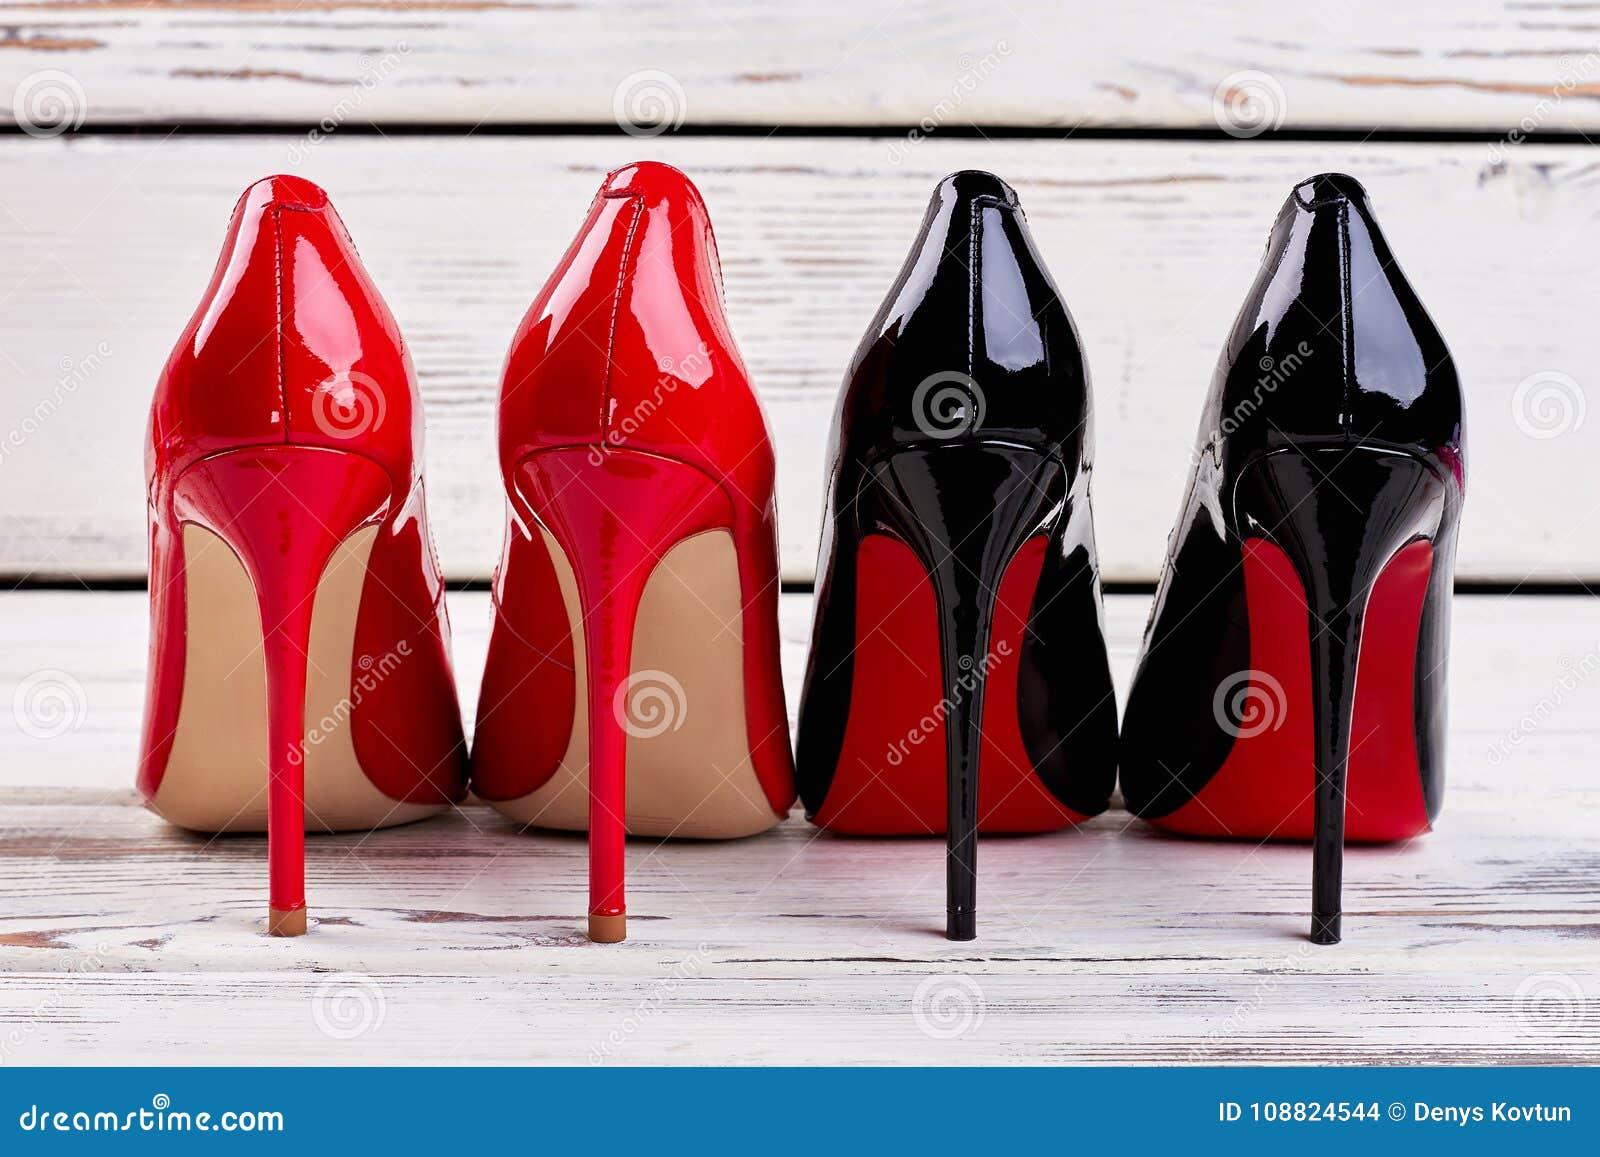 727dee56304 Κόκκινα και μαύρα παπούτσια αντλιών Στοκ Εικόνες - εικόνα από ...